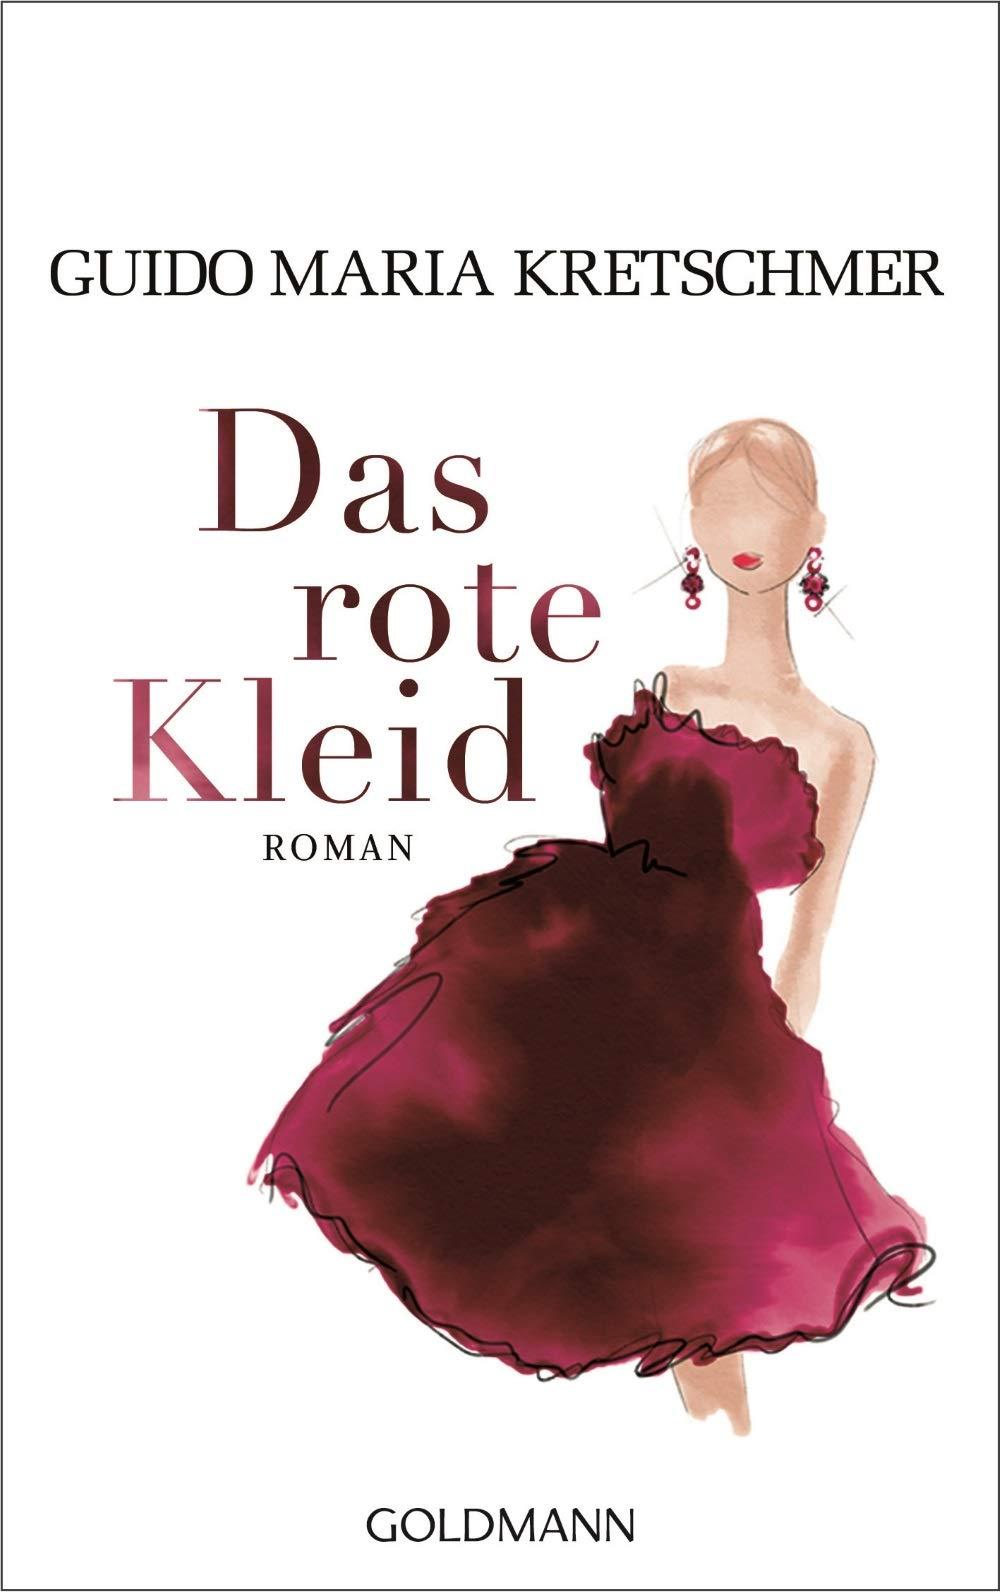 Das rote Kleid: Roman: Amazon.de: Kretschmer, Guido Maria: Bücher